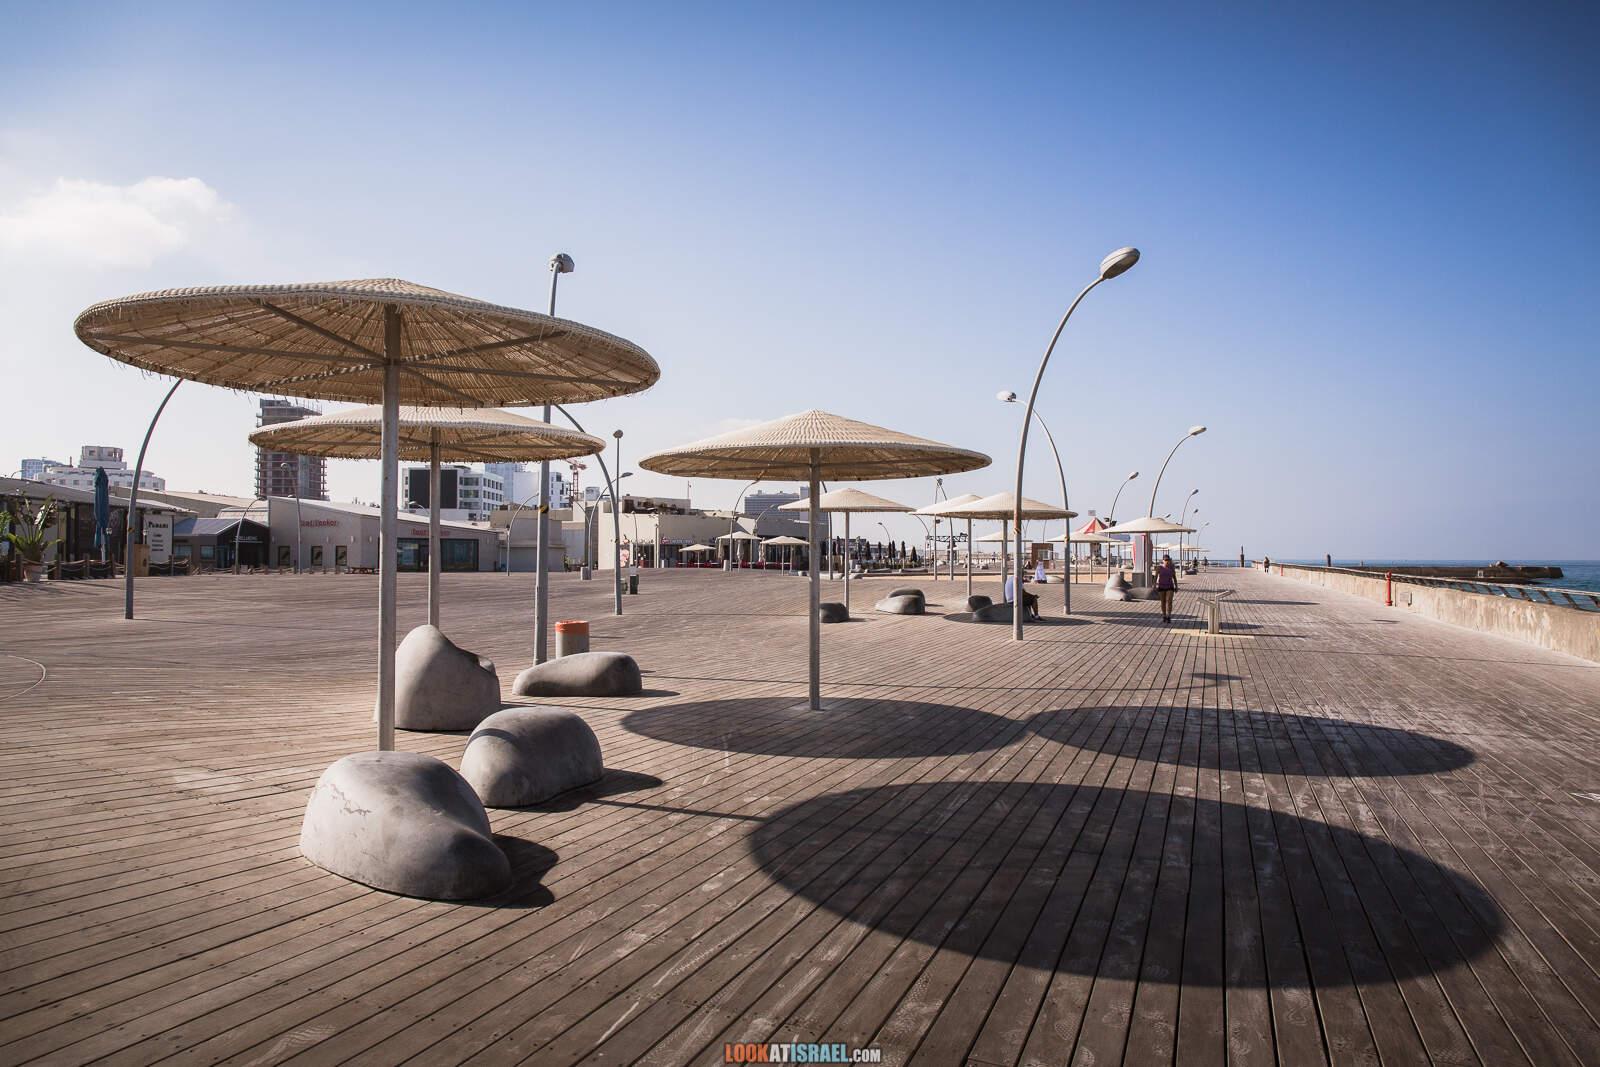 Порт Тель-Авива во время карантина   Lockdown in port of Tel Aviv   LookAtIsrael.com - Фото путешествия по Израилю